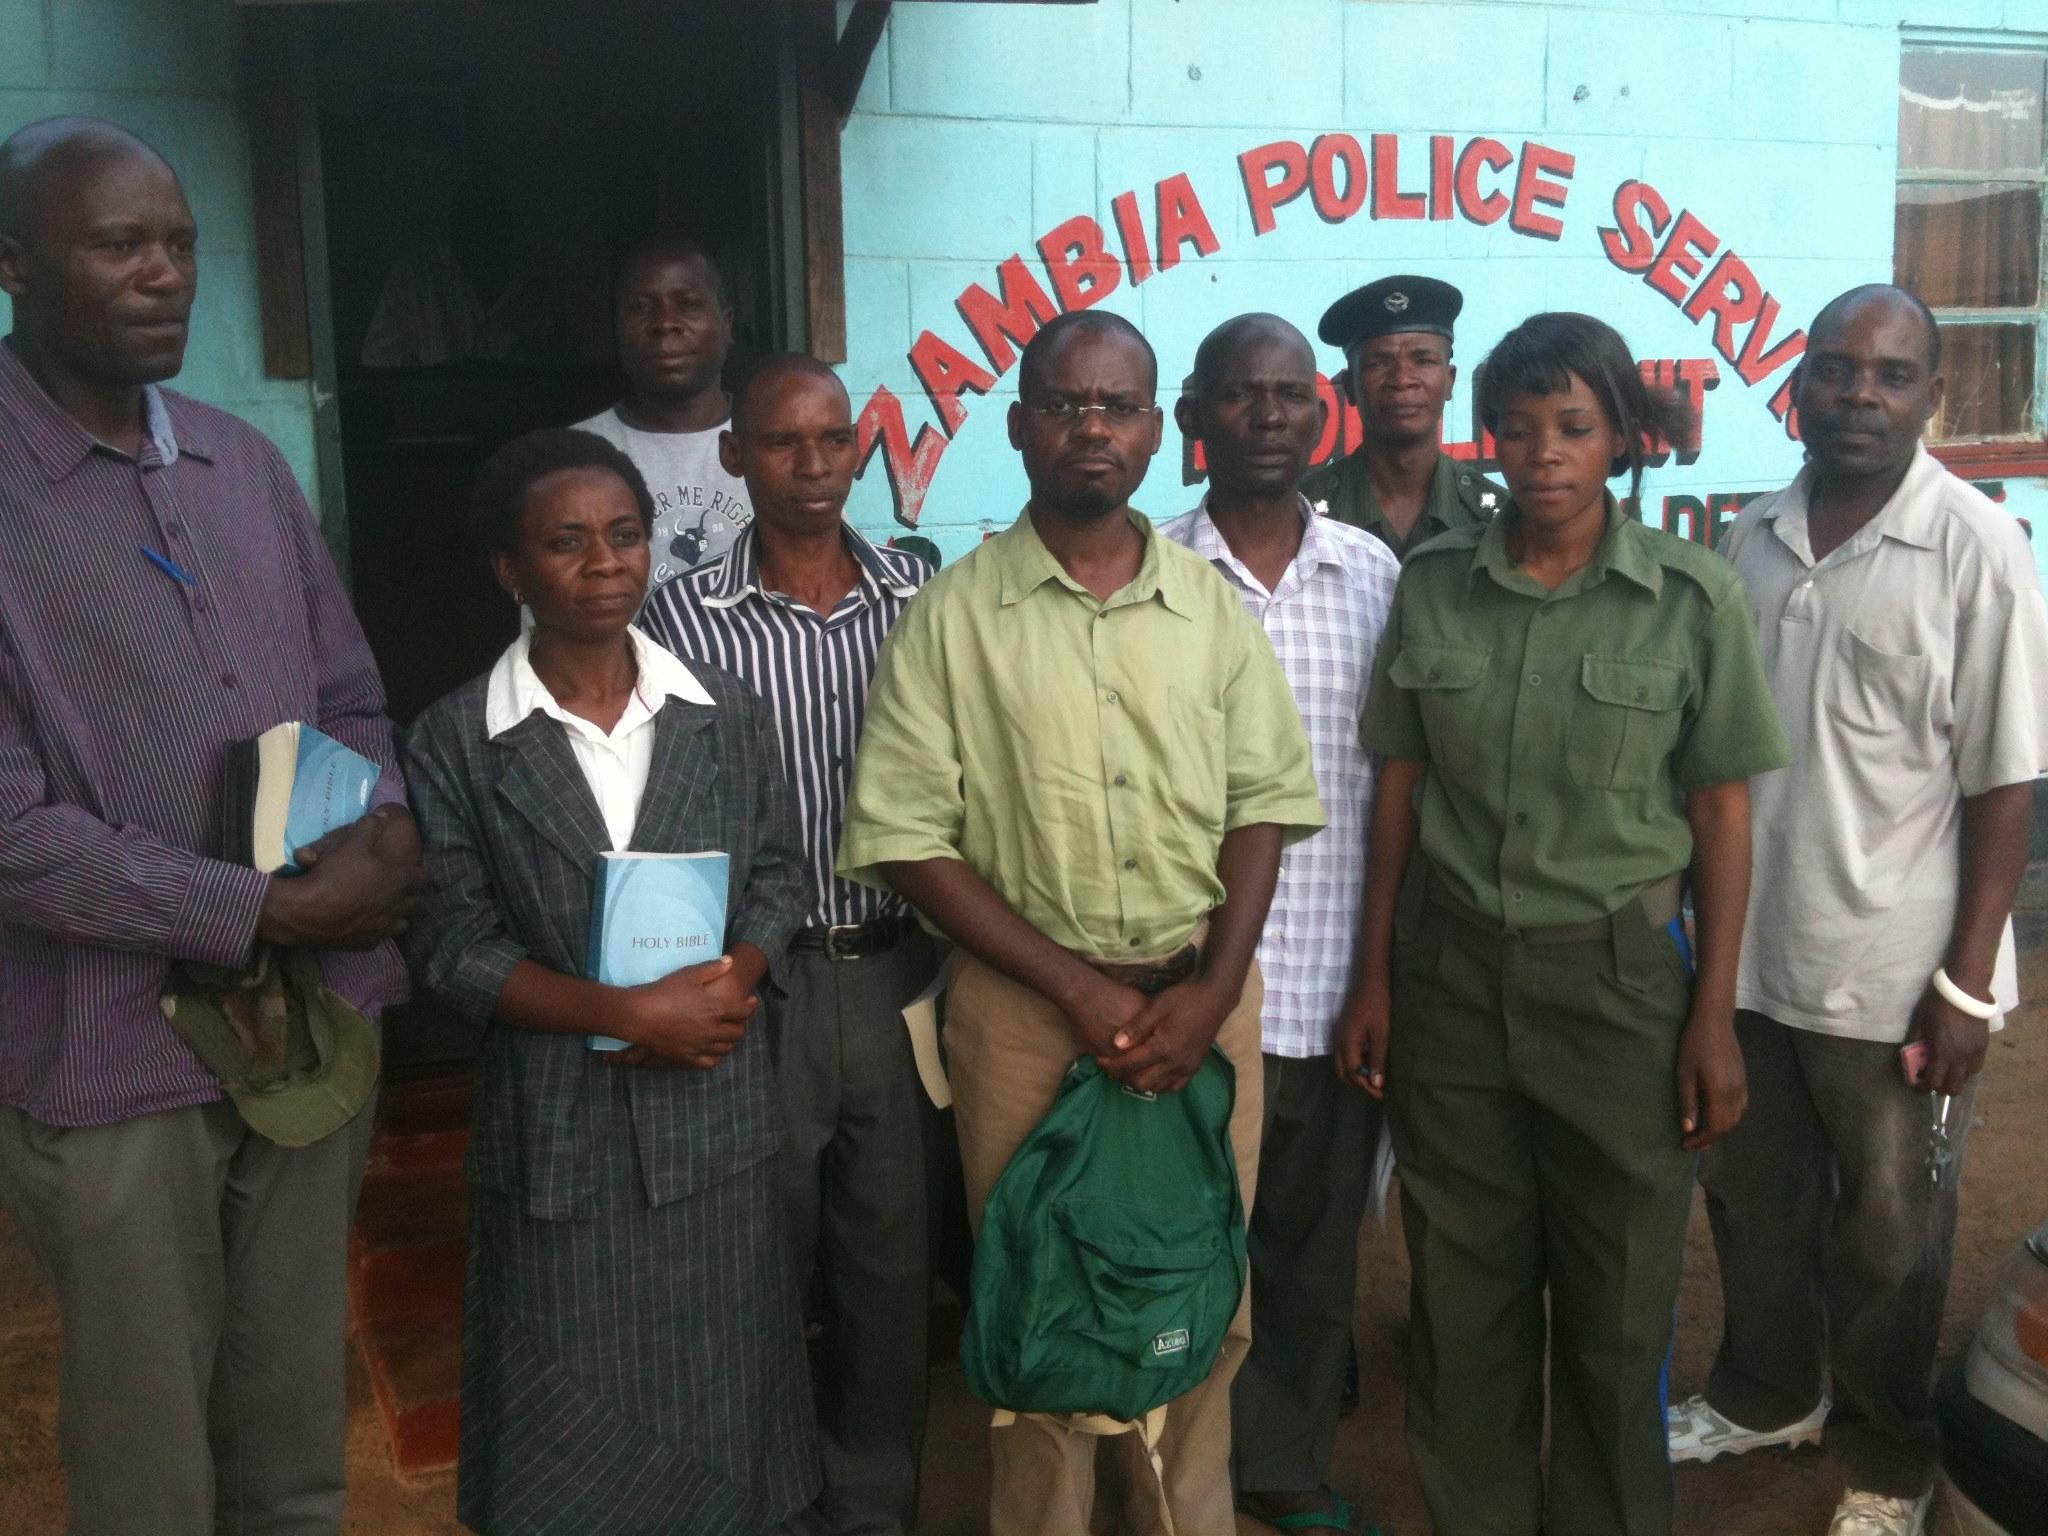 Zambia Police Outreach